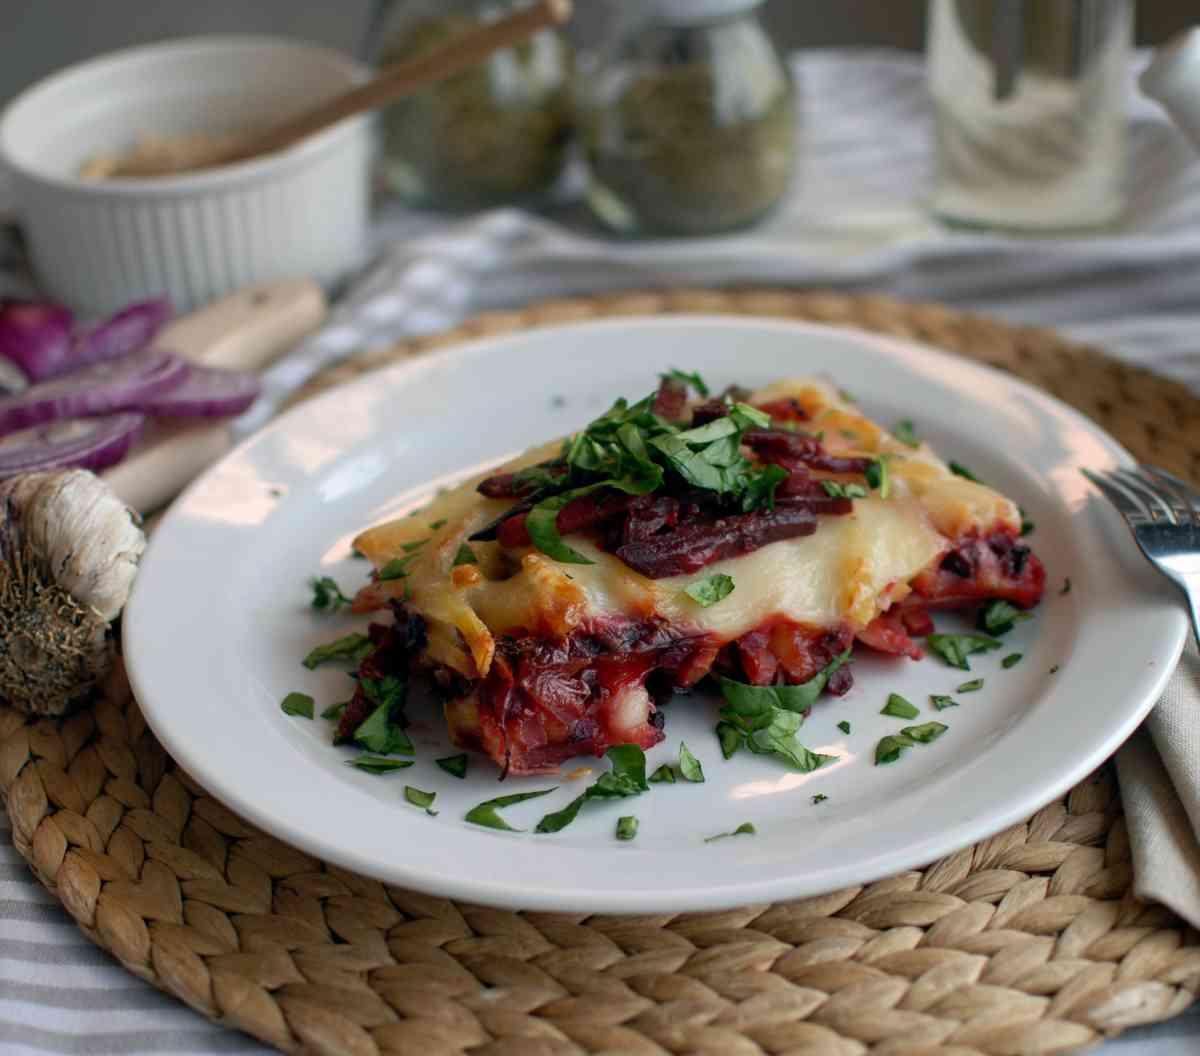 Zapečené brambory s červenou řepou, šopský salát